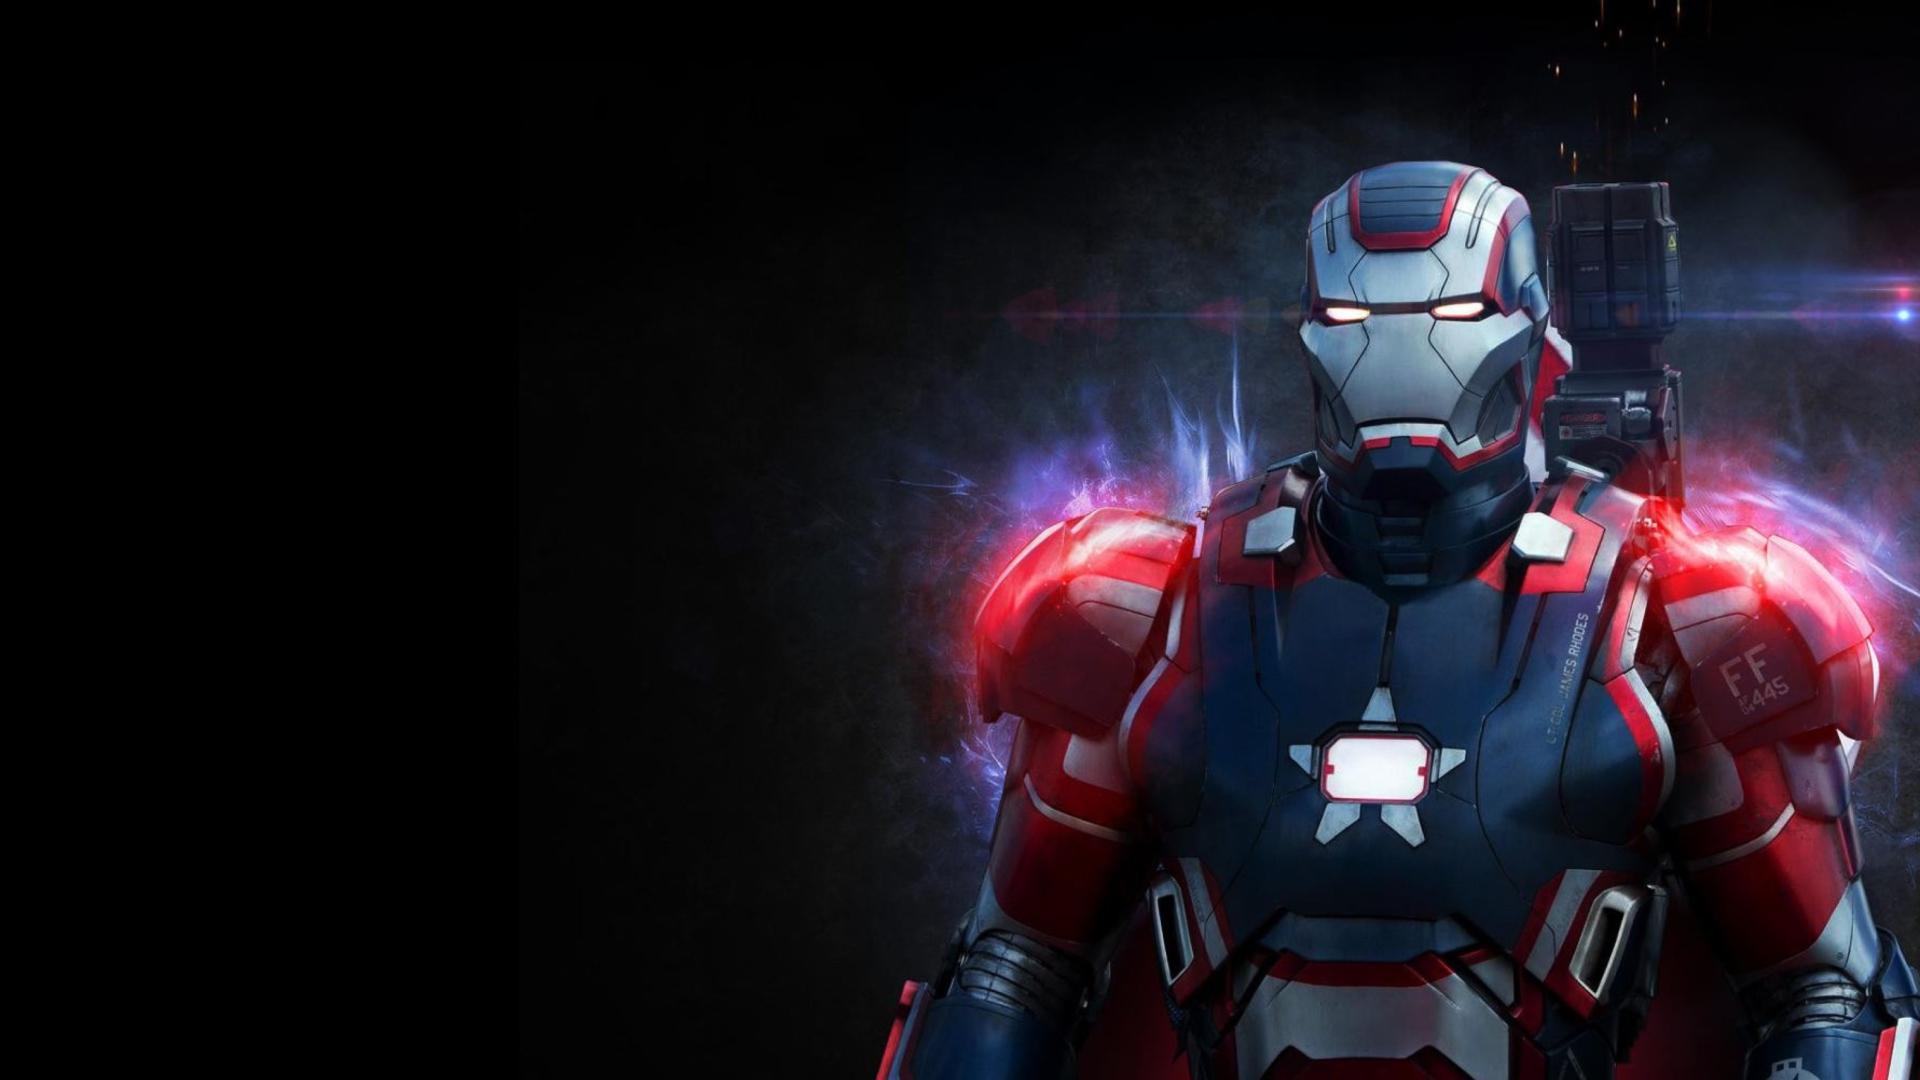 Iron man sfondi gratuiti per desktop 1920x1080 full hd for Sfondi iron man